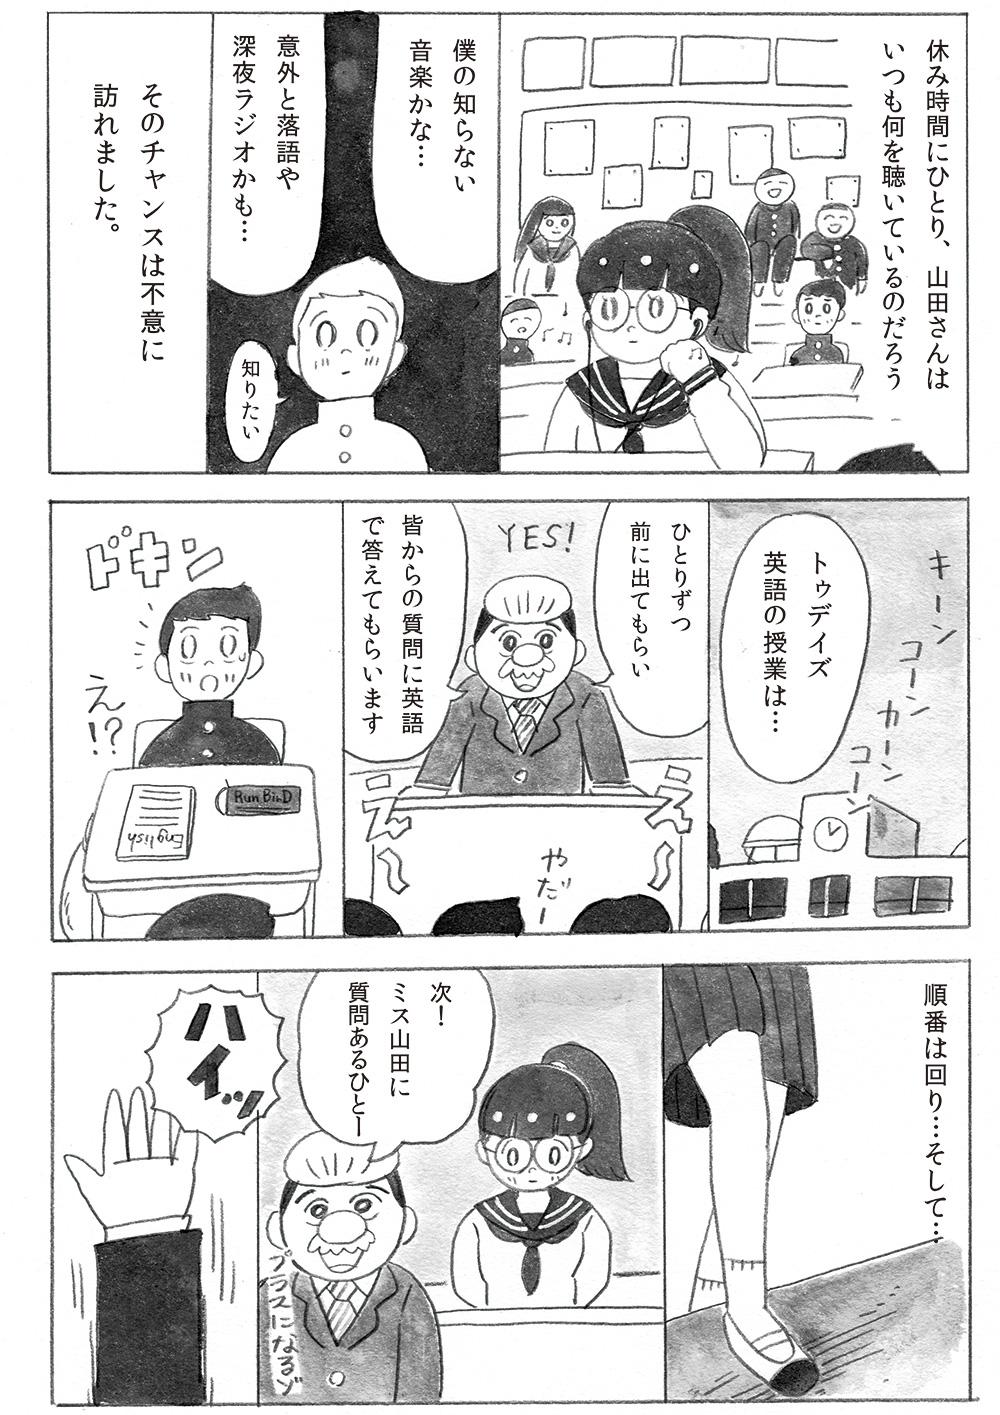 jimbo_satoshi_meetia05_1